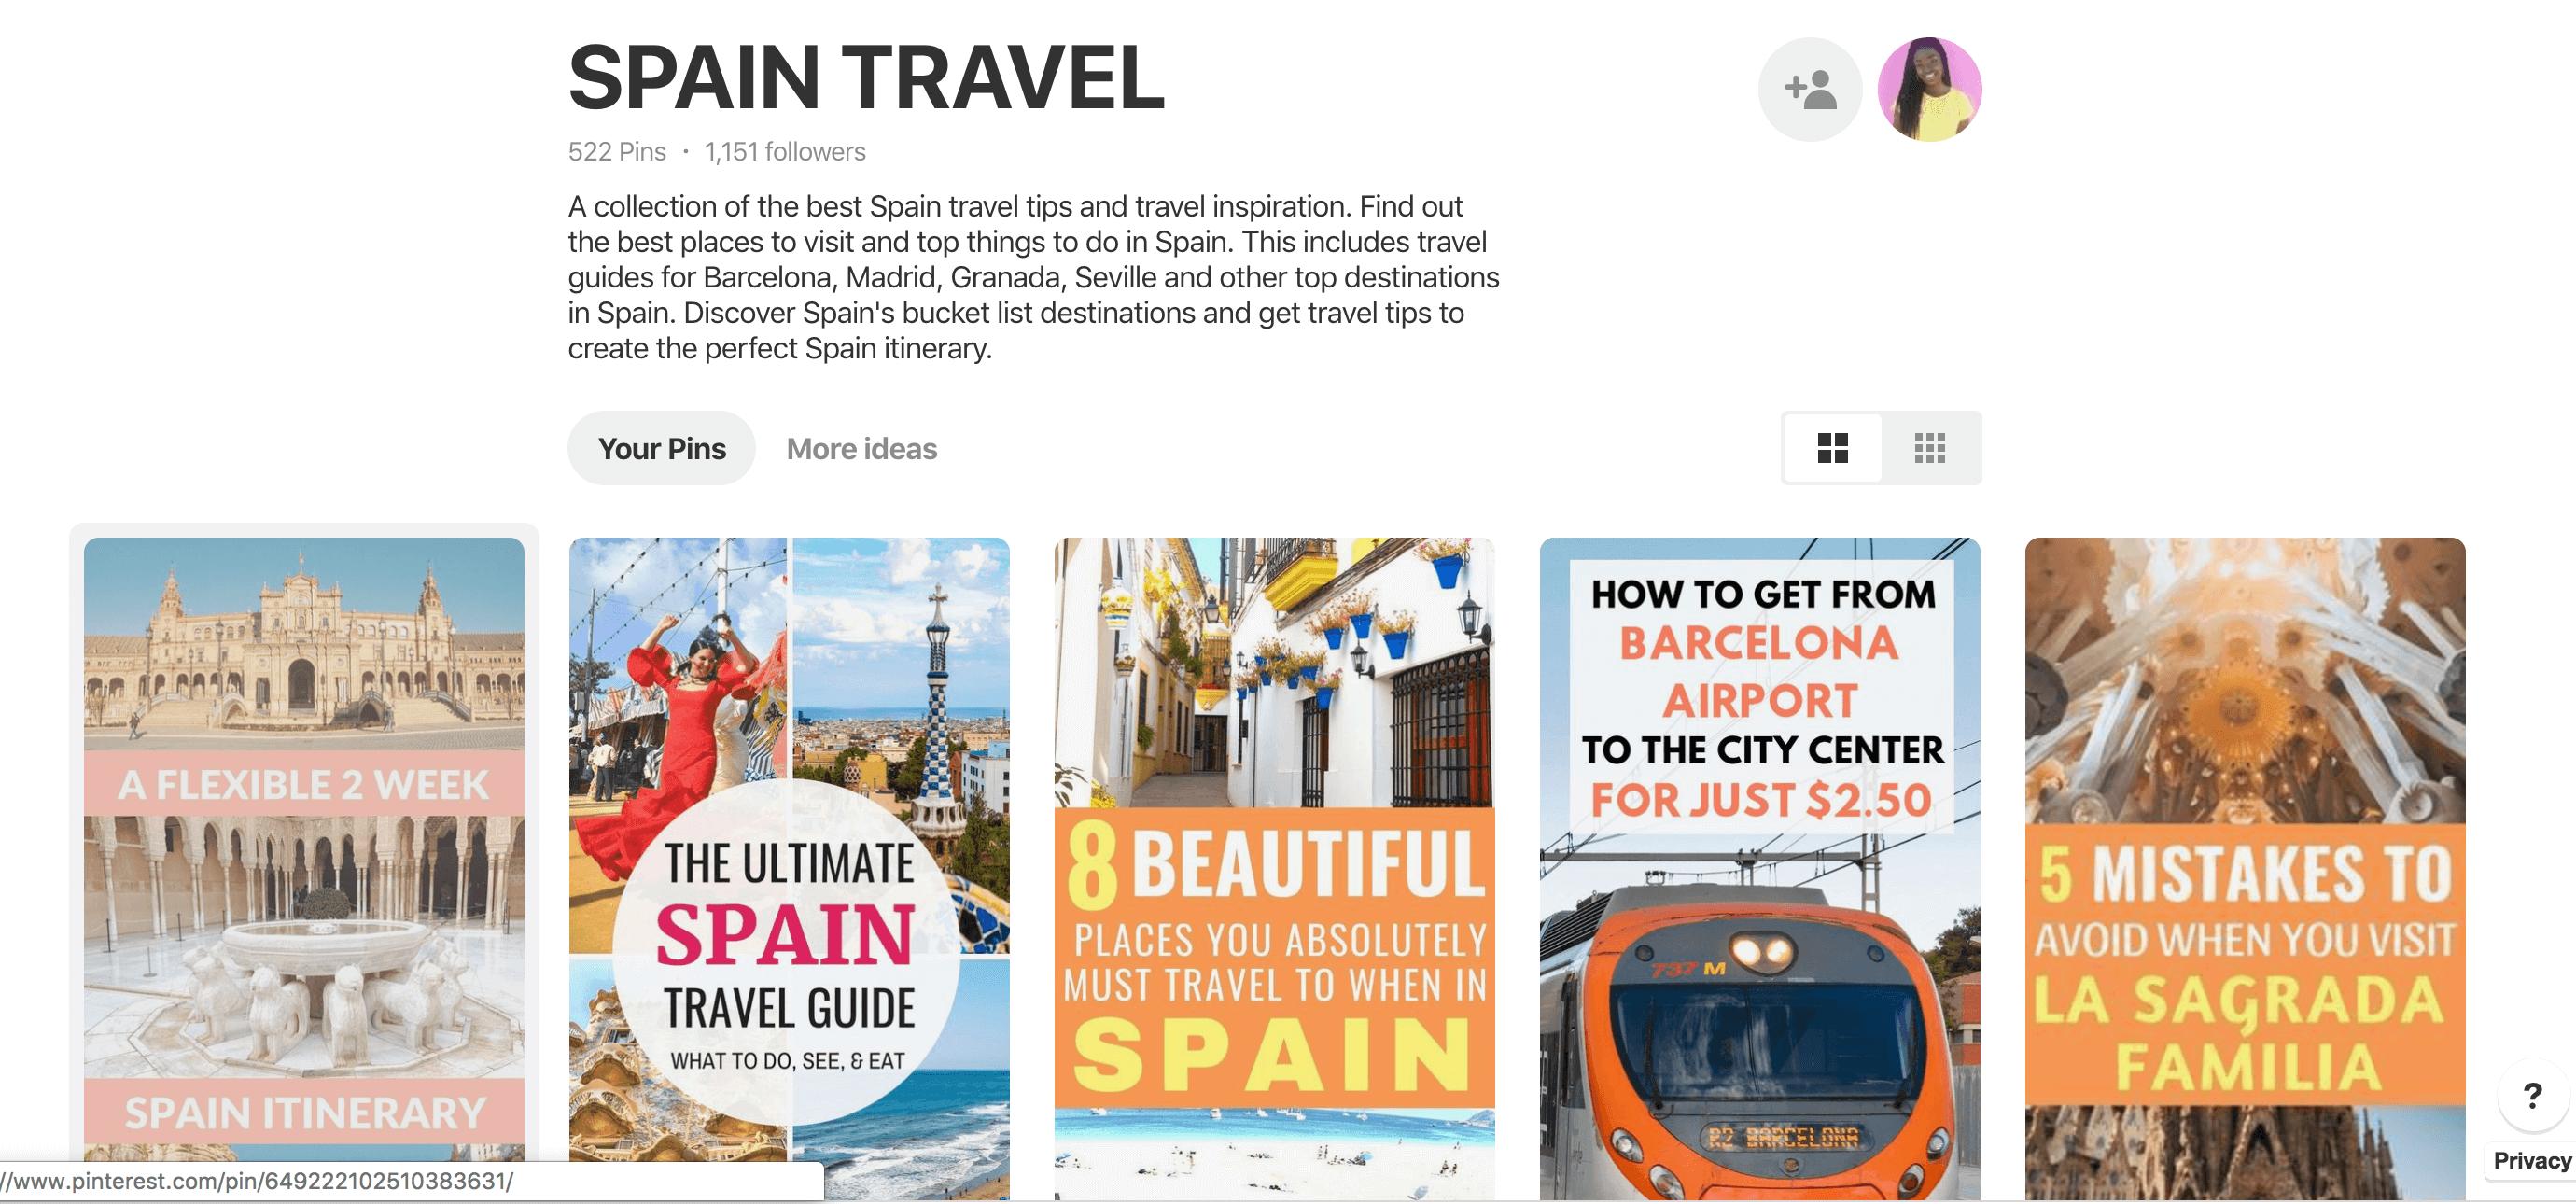 Pinterest for travel bloggers - Spain travel group board